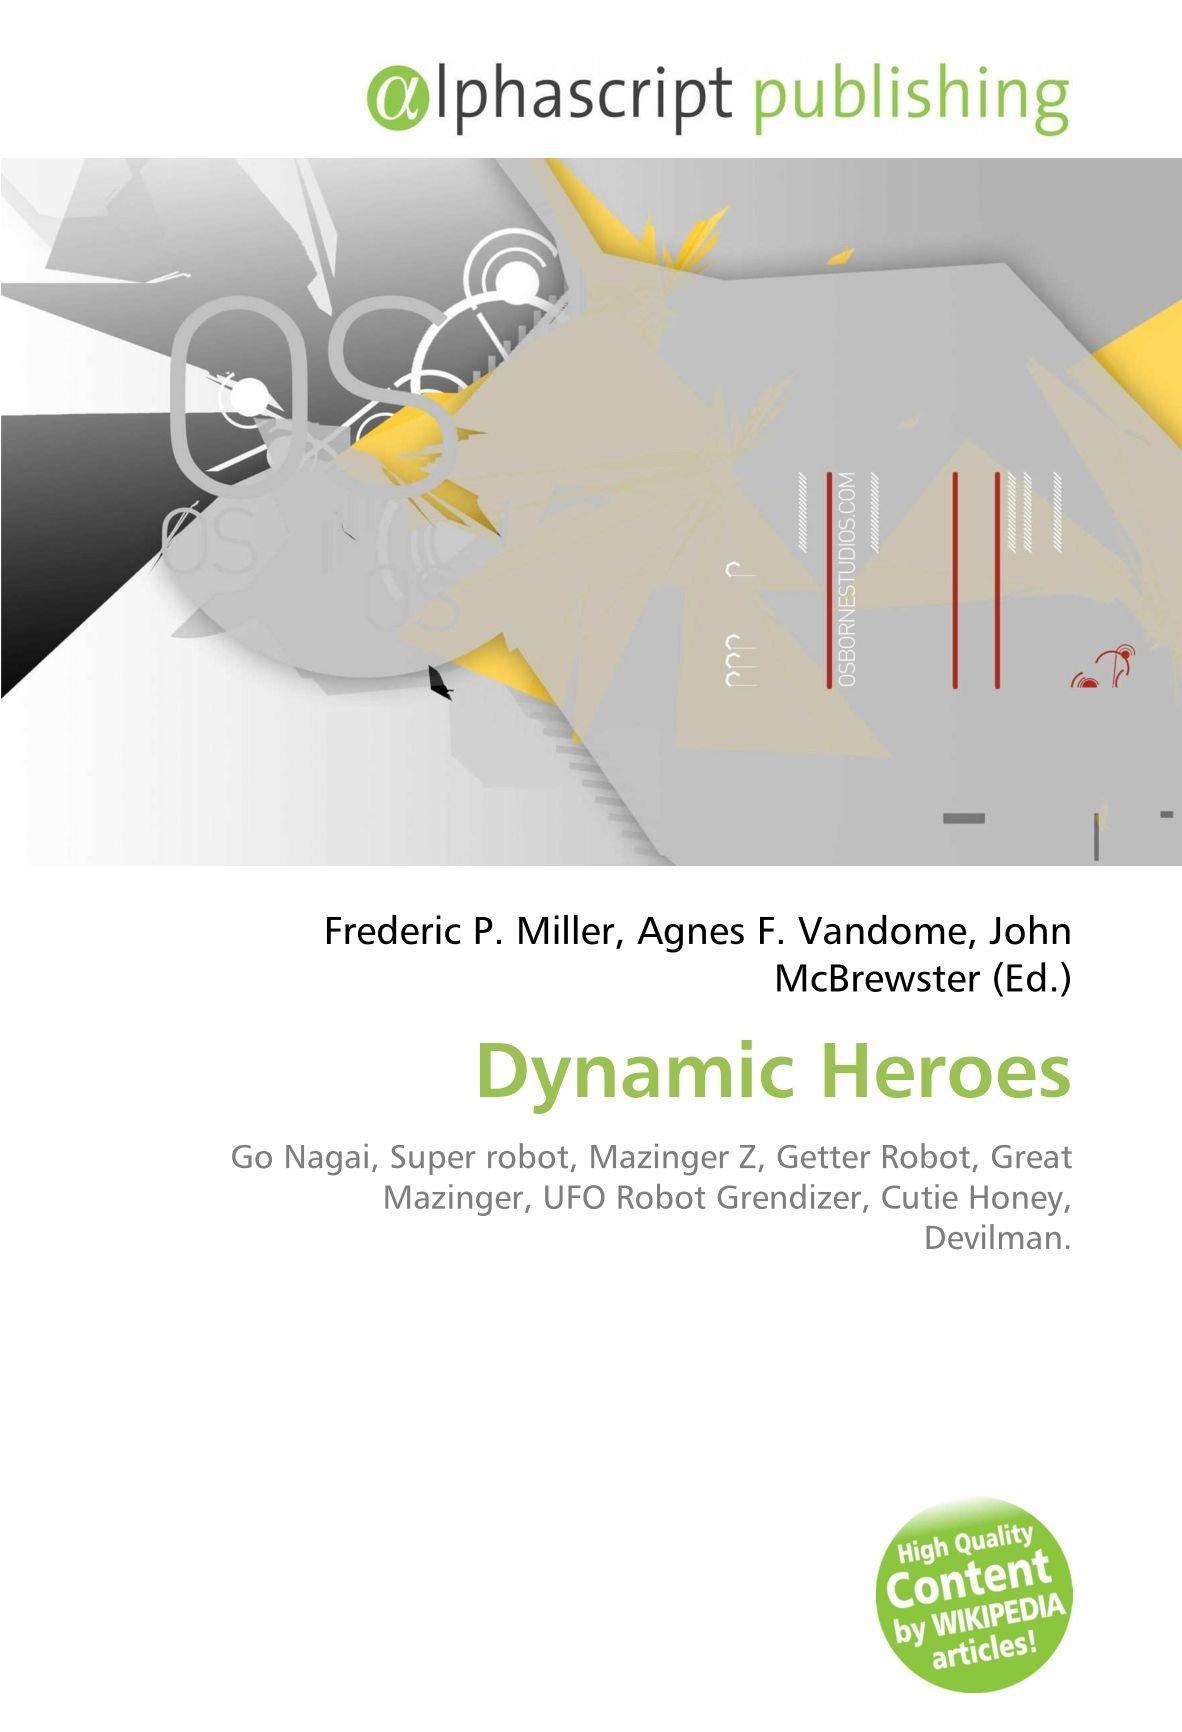 Dynamic Heroes: Go Nagai, Super robot, Mazinger Z, Getter Robot, Great Mazinger, UFO Robot Grendizer, Cutie Honey, Devilman.: Amazon.es: Miller, Frederic P., Vandome, Agnes F., McBrewster, John: Libros en idiomas extranjeros